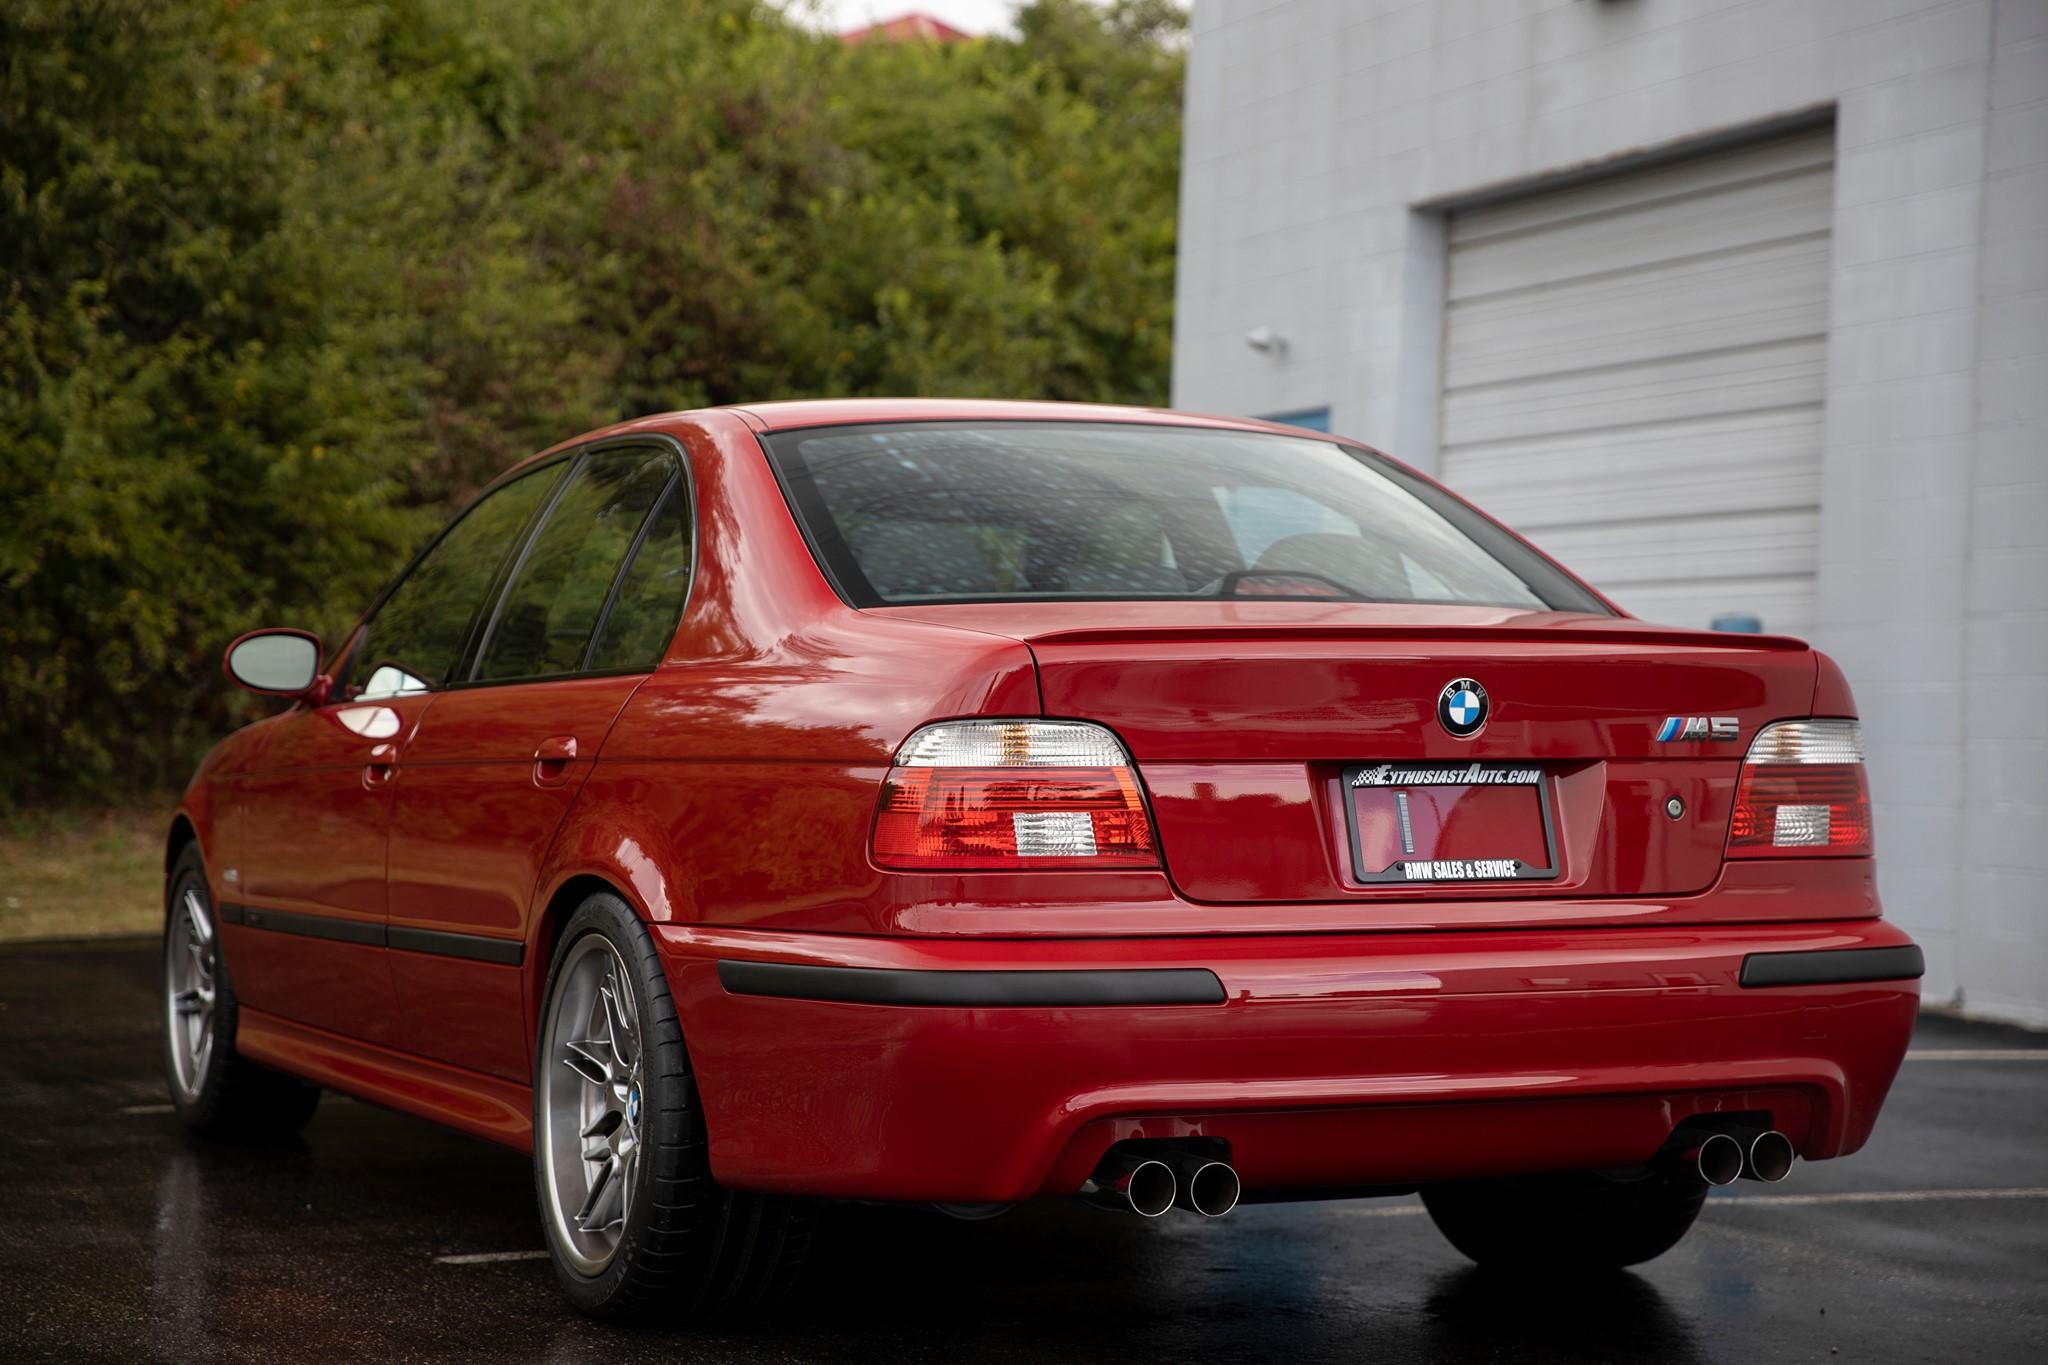 BMW_M5_E39_Imola_Red_0013